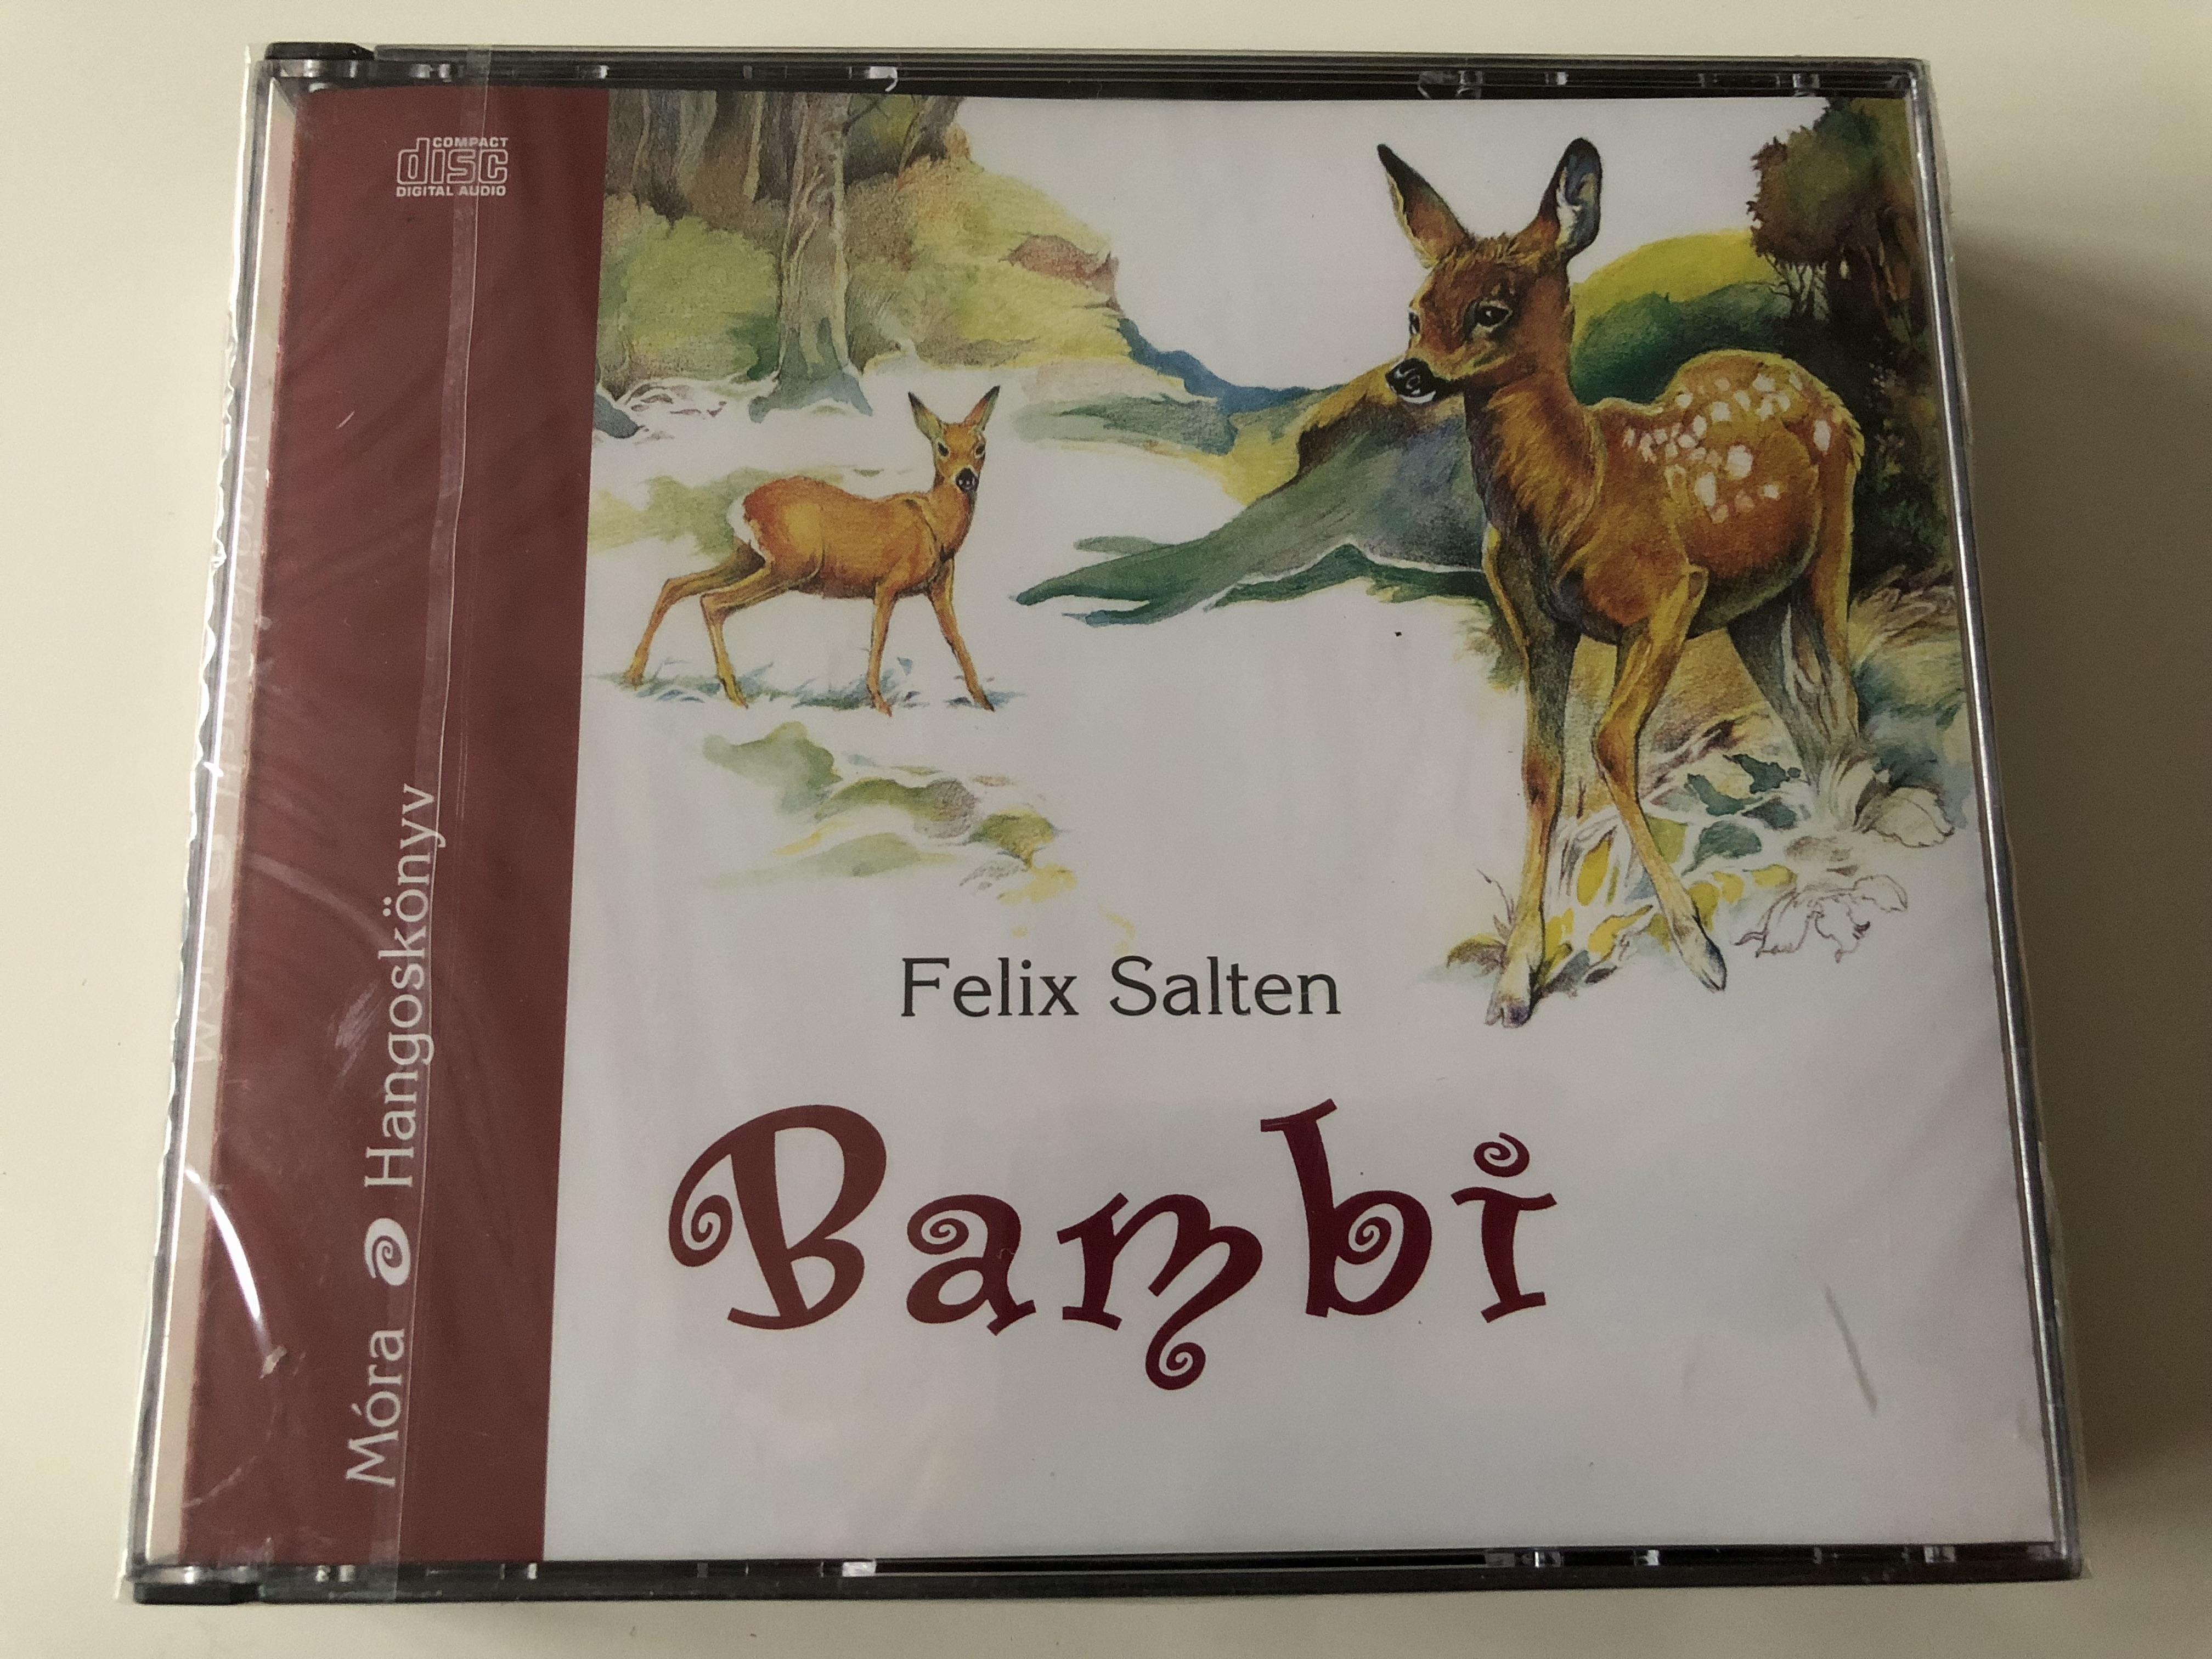 bambi-by-felix-salten-hungarian-language-audio-book-reak-by-kubik-anna-m-ra-k-nyvkiad-2007-5x-audio-cd-1-.jpg